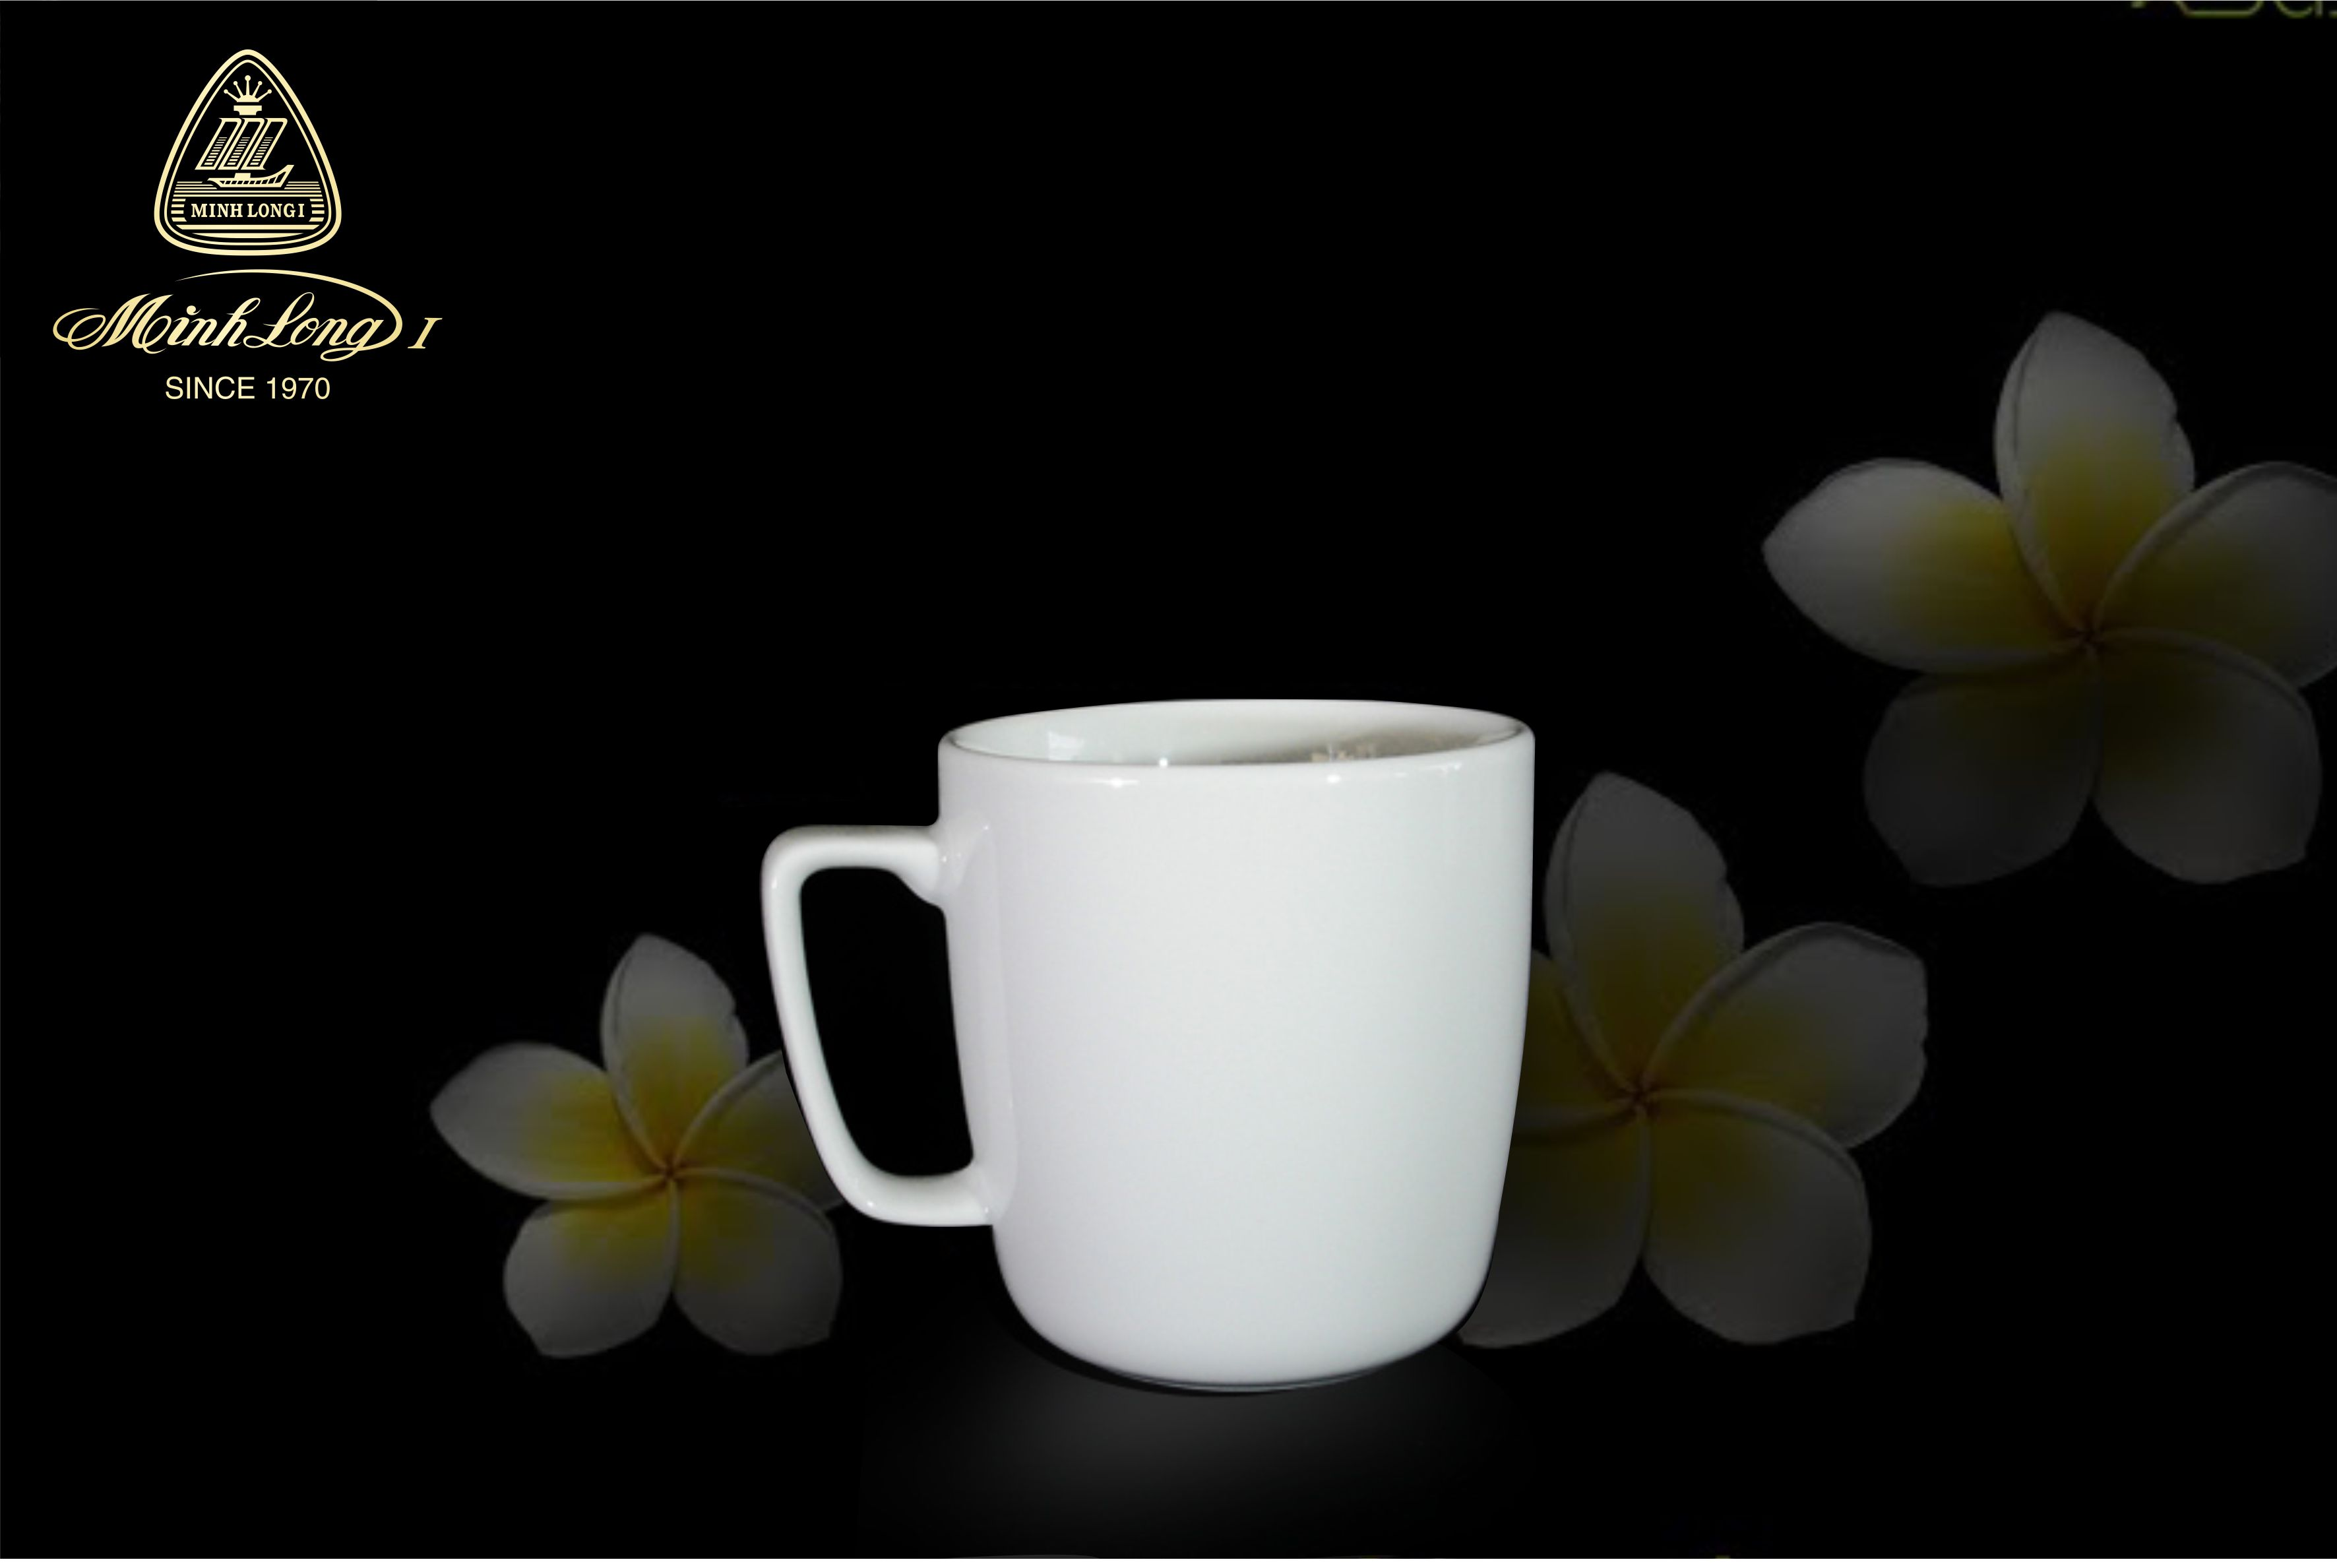 Ca trà 0.38L JAS Trắng 153817000 Minh Long